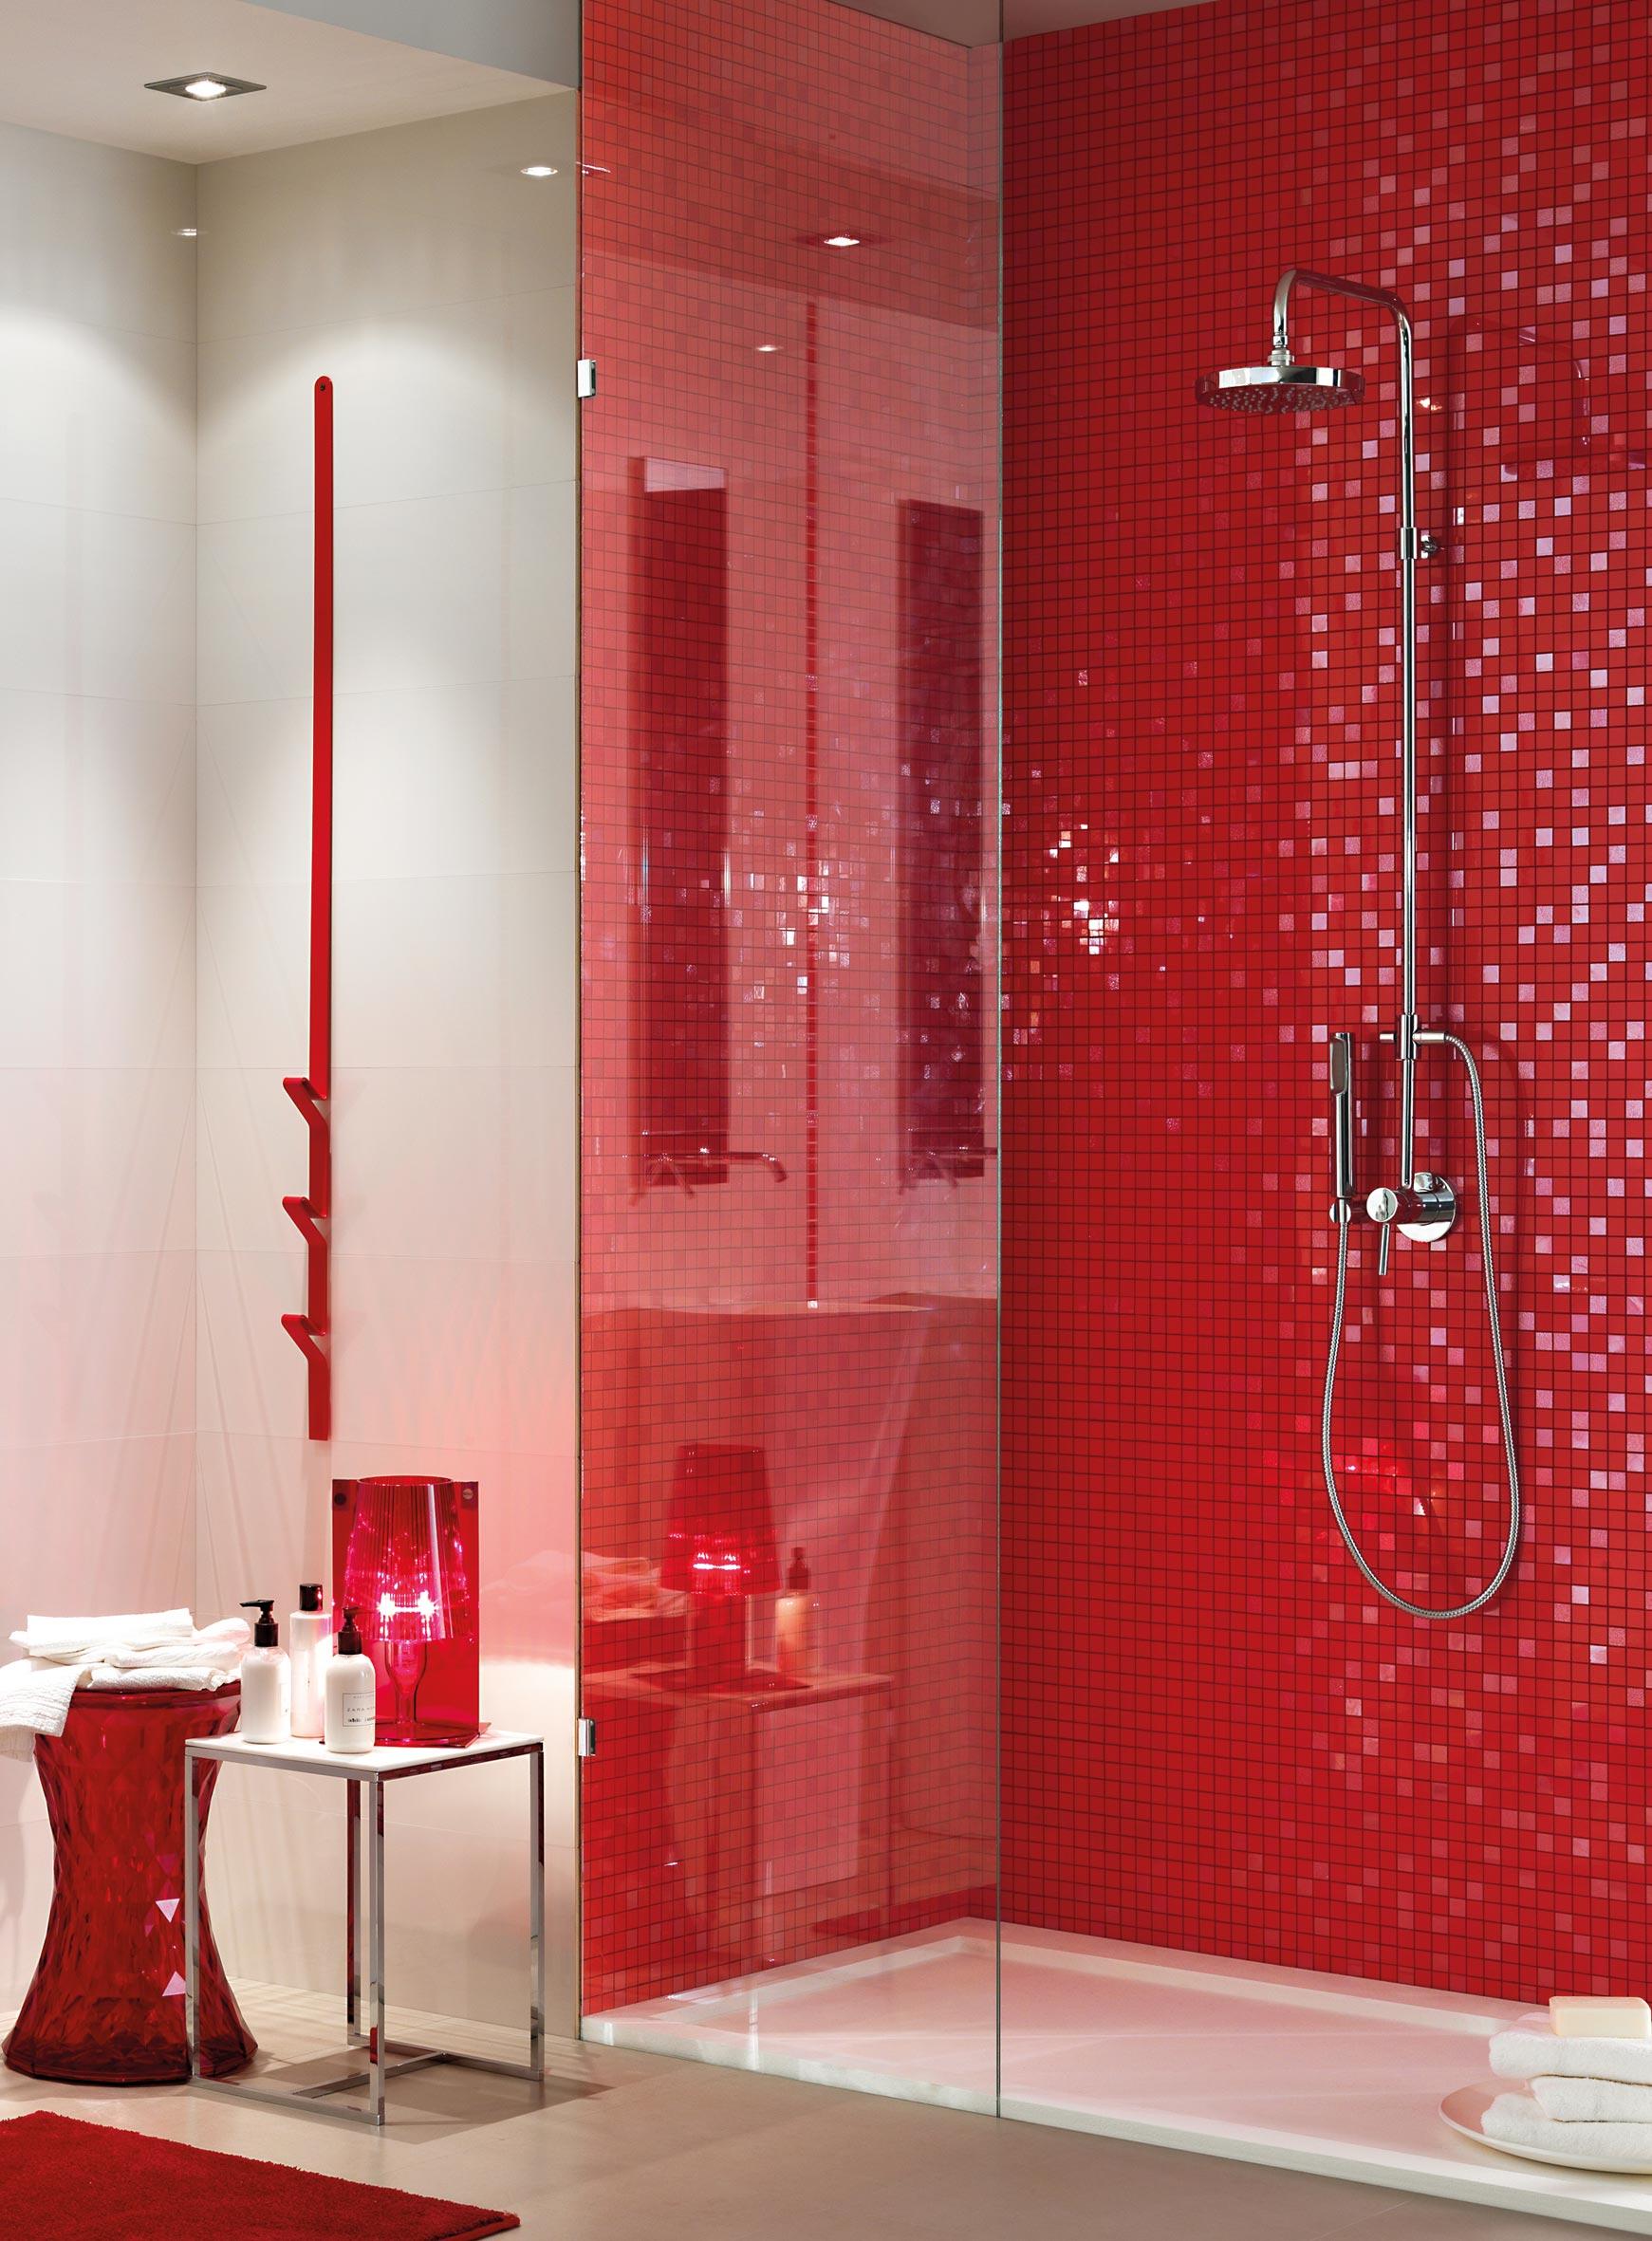 Bagno effetto mosaico mosaico arancio bagno effetto mosaico artigiano produzione mosaici su - Piastrelle bagno effetto mosaico ...